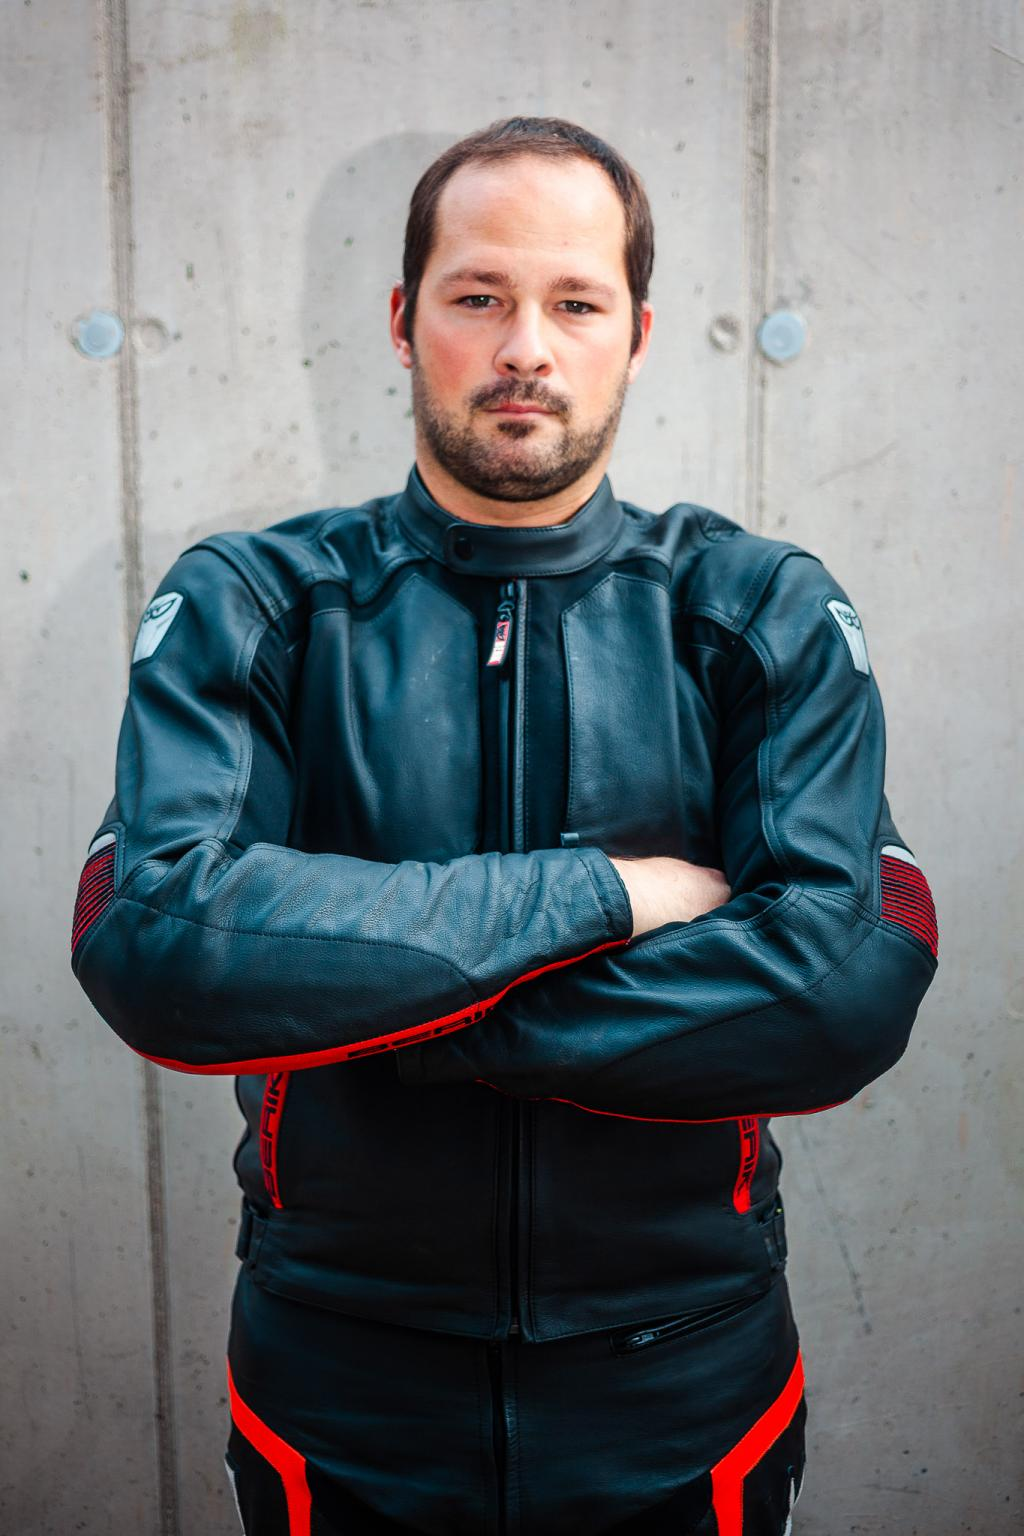 Berik Flexius Motorrad Lederhose in 2019 | Motorrad